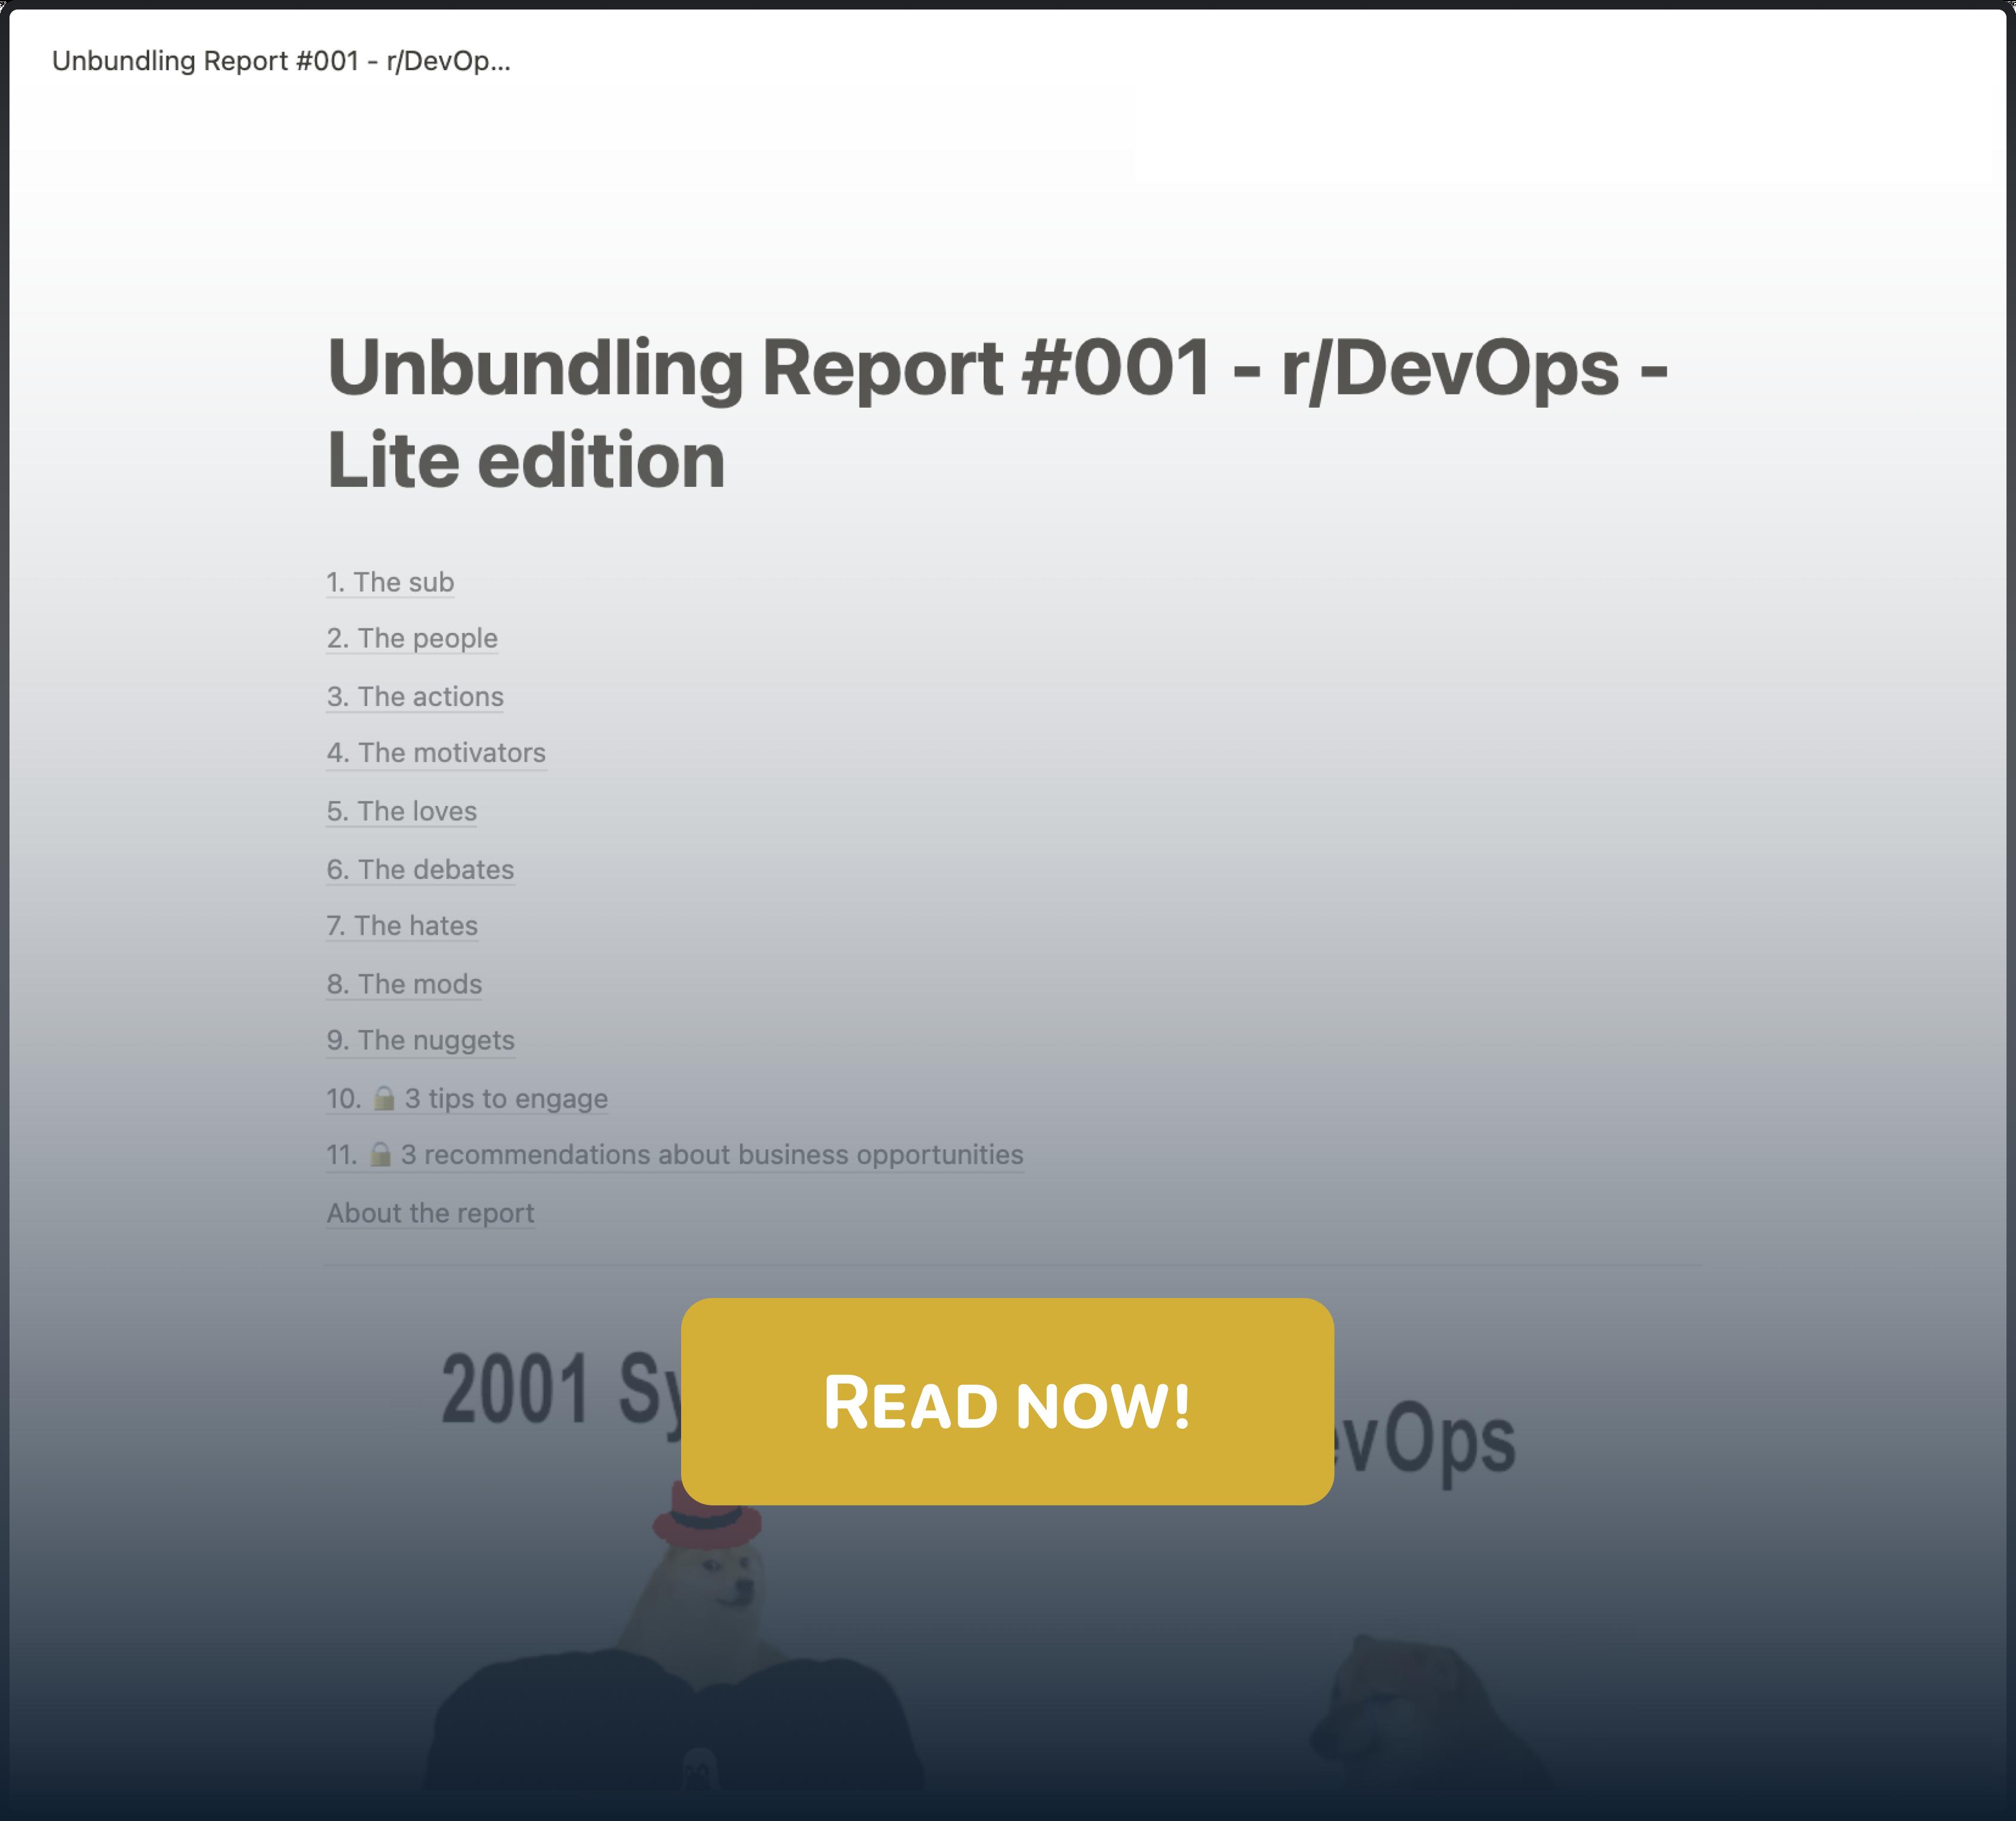 Unbundling Report